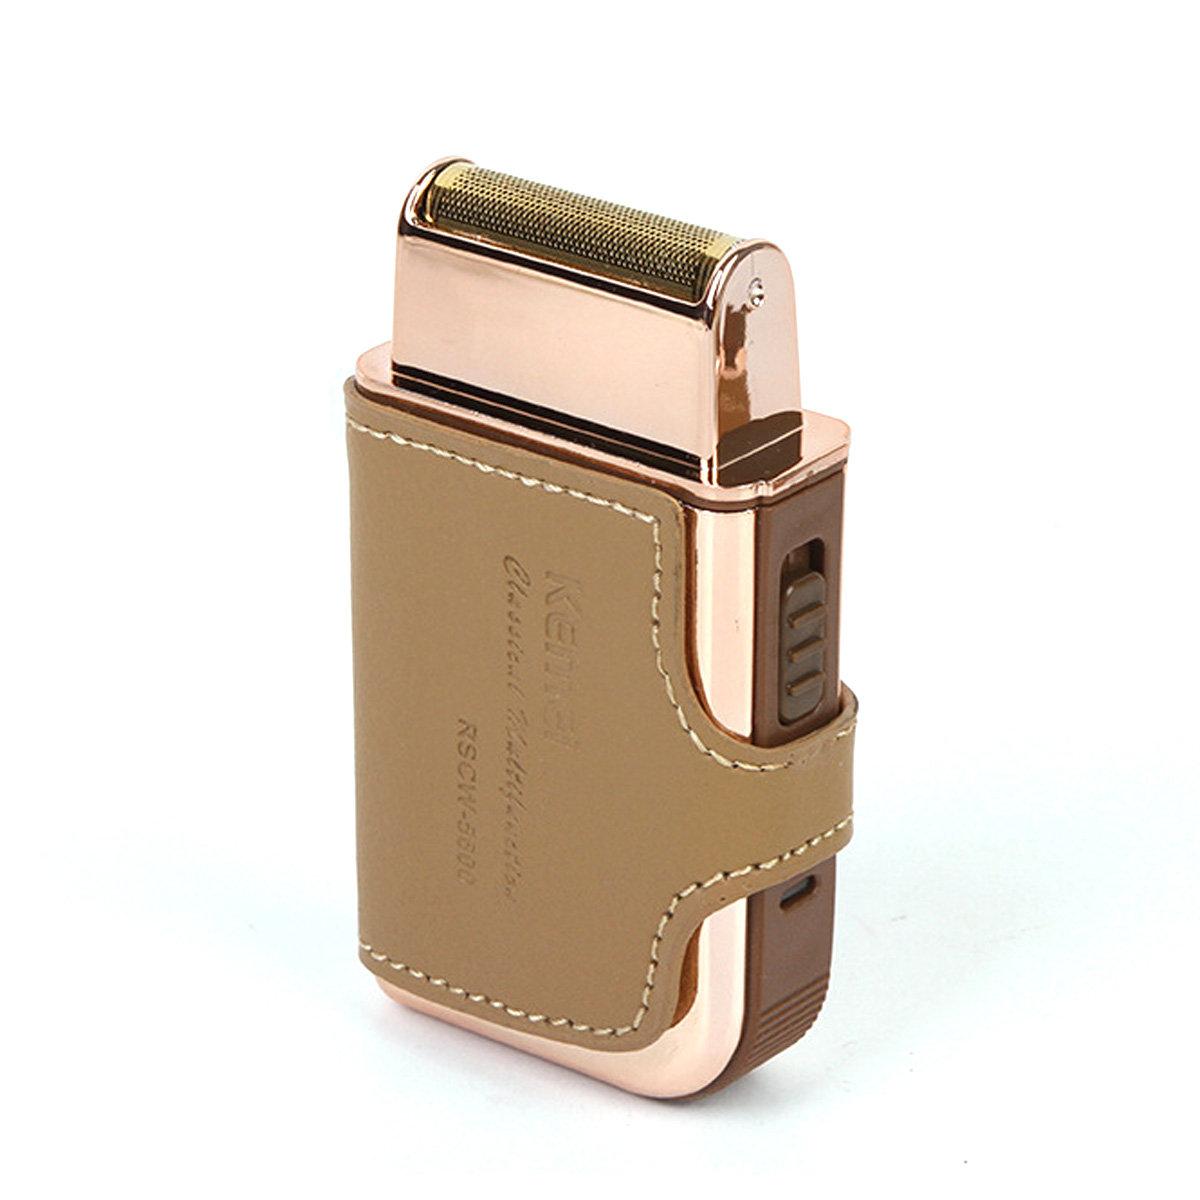 Mini Electric Men's Razor Portable USB Rechargeable Shaver With Mirror